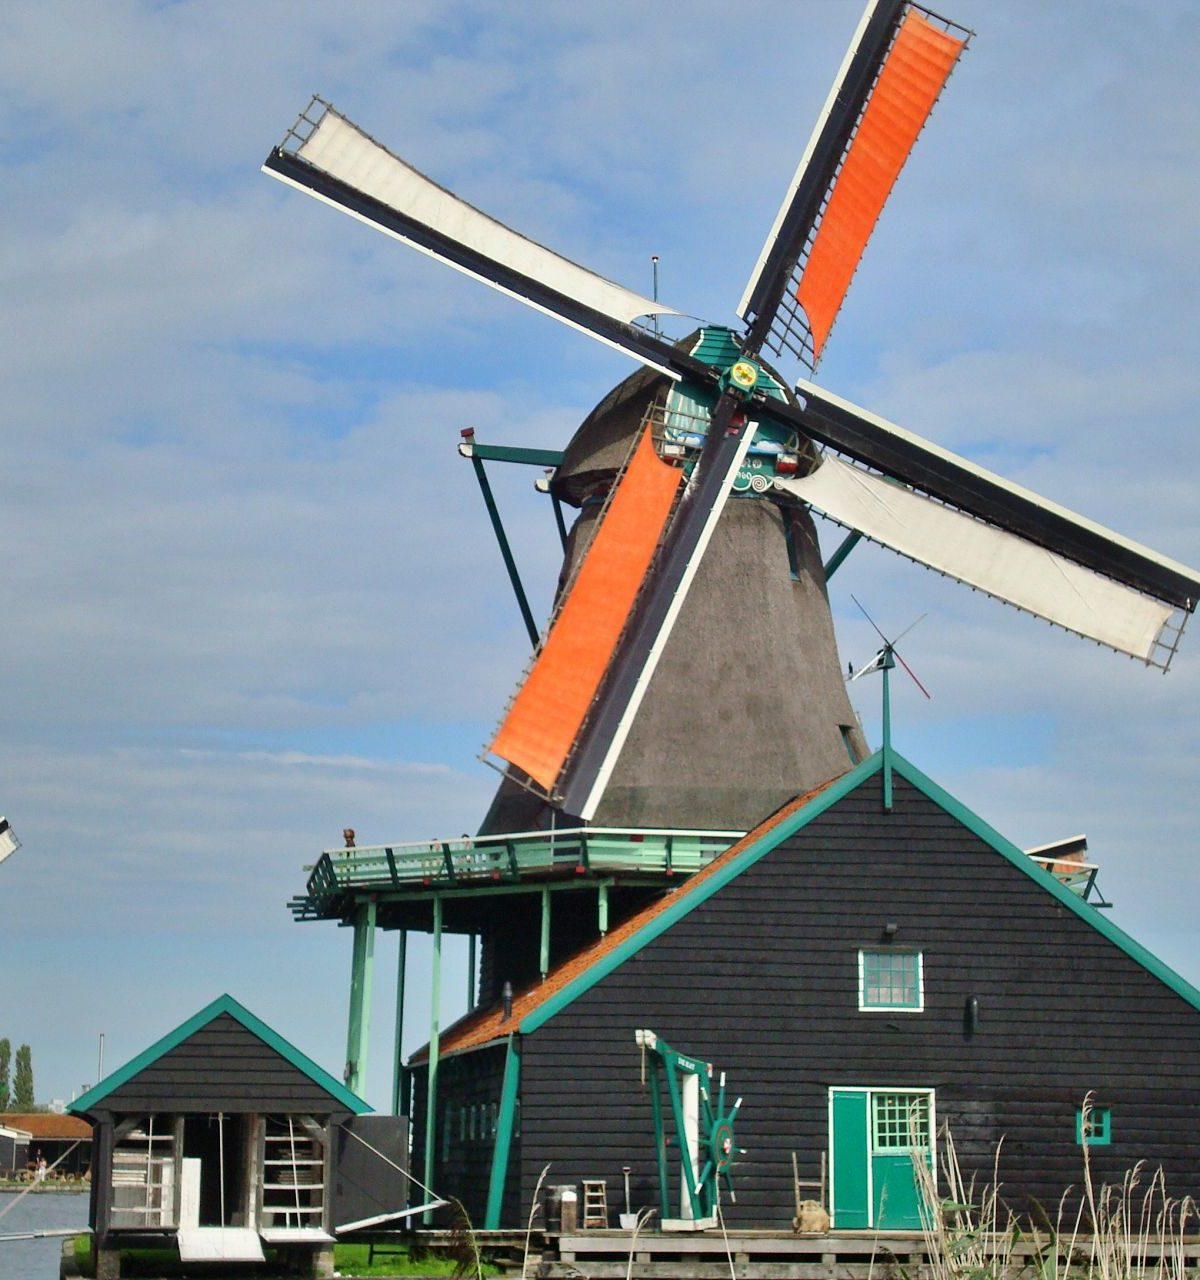 zaanse schans noord holland molen hotelb&b lanormande westwoud21